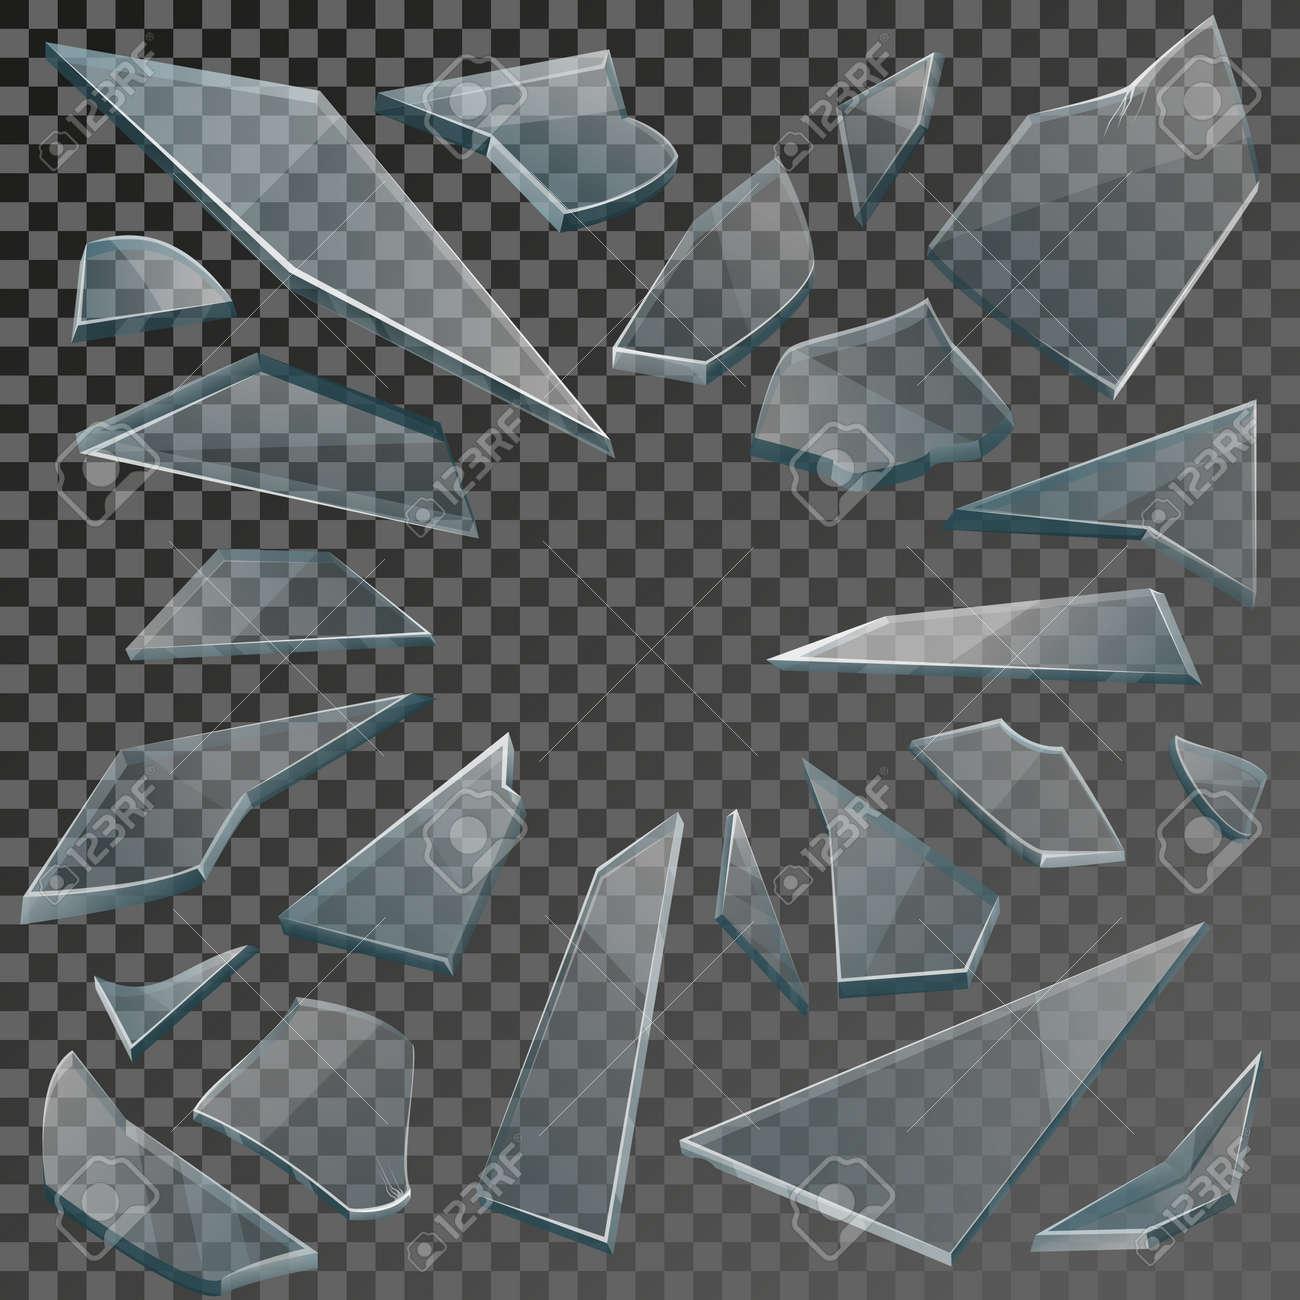 Realistic transparent shards of broken glass on checkered backdrop. Vector illustration - 167187155